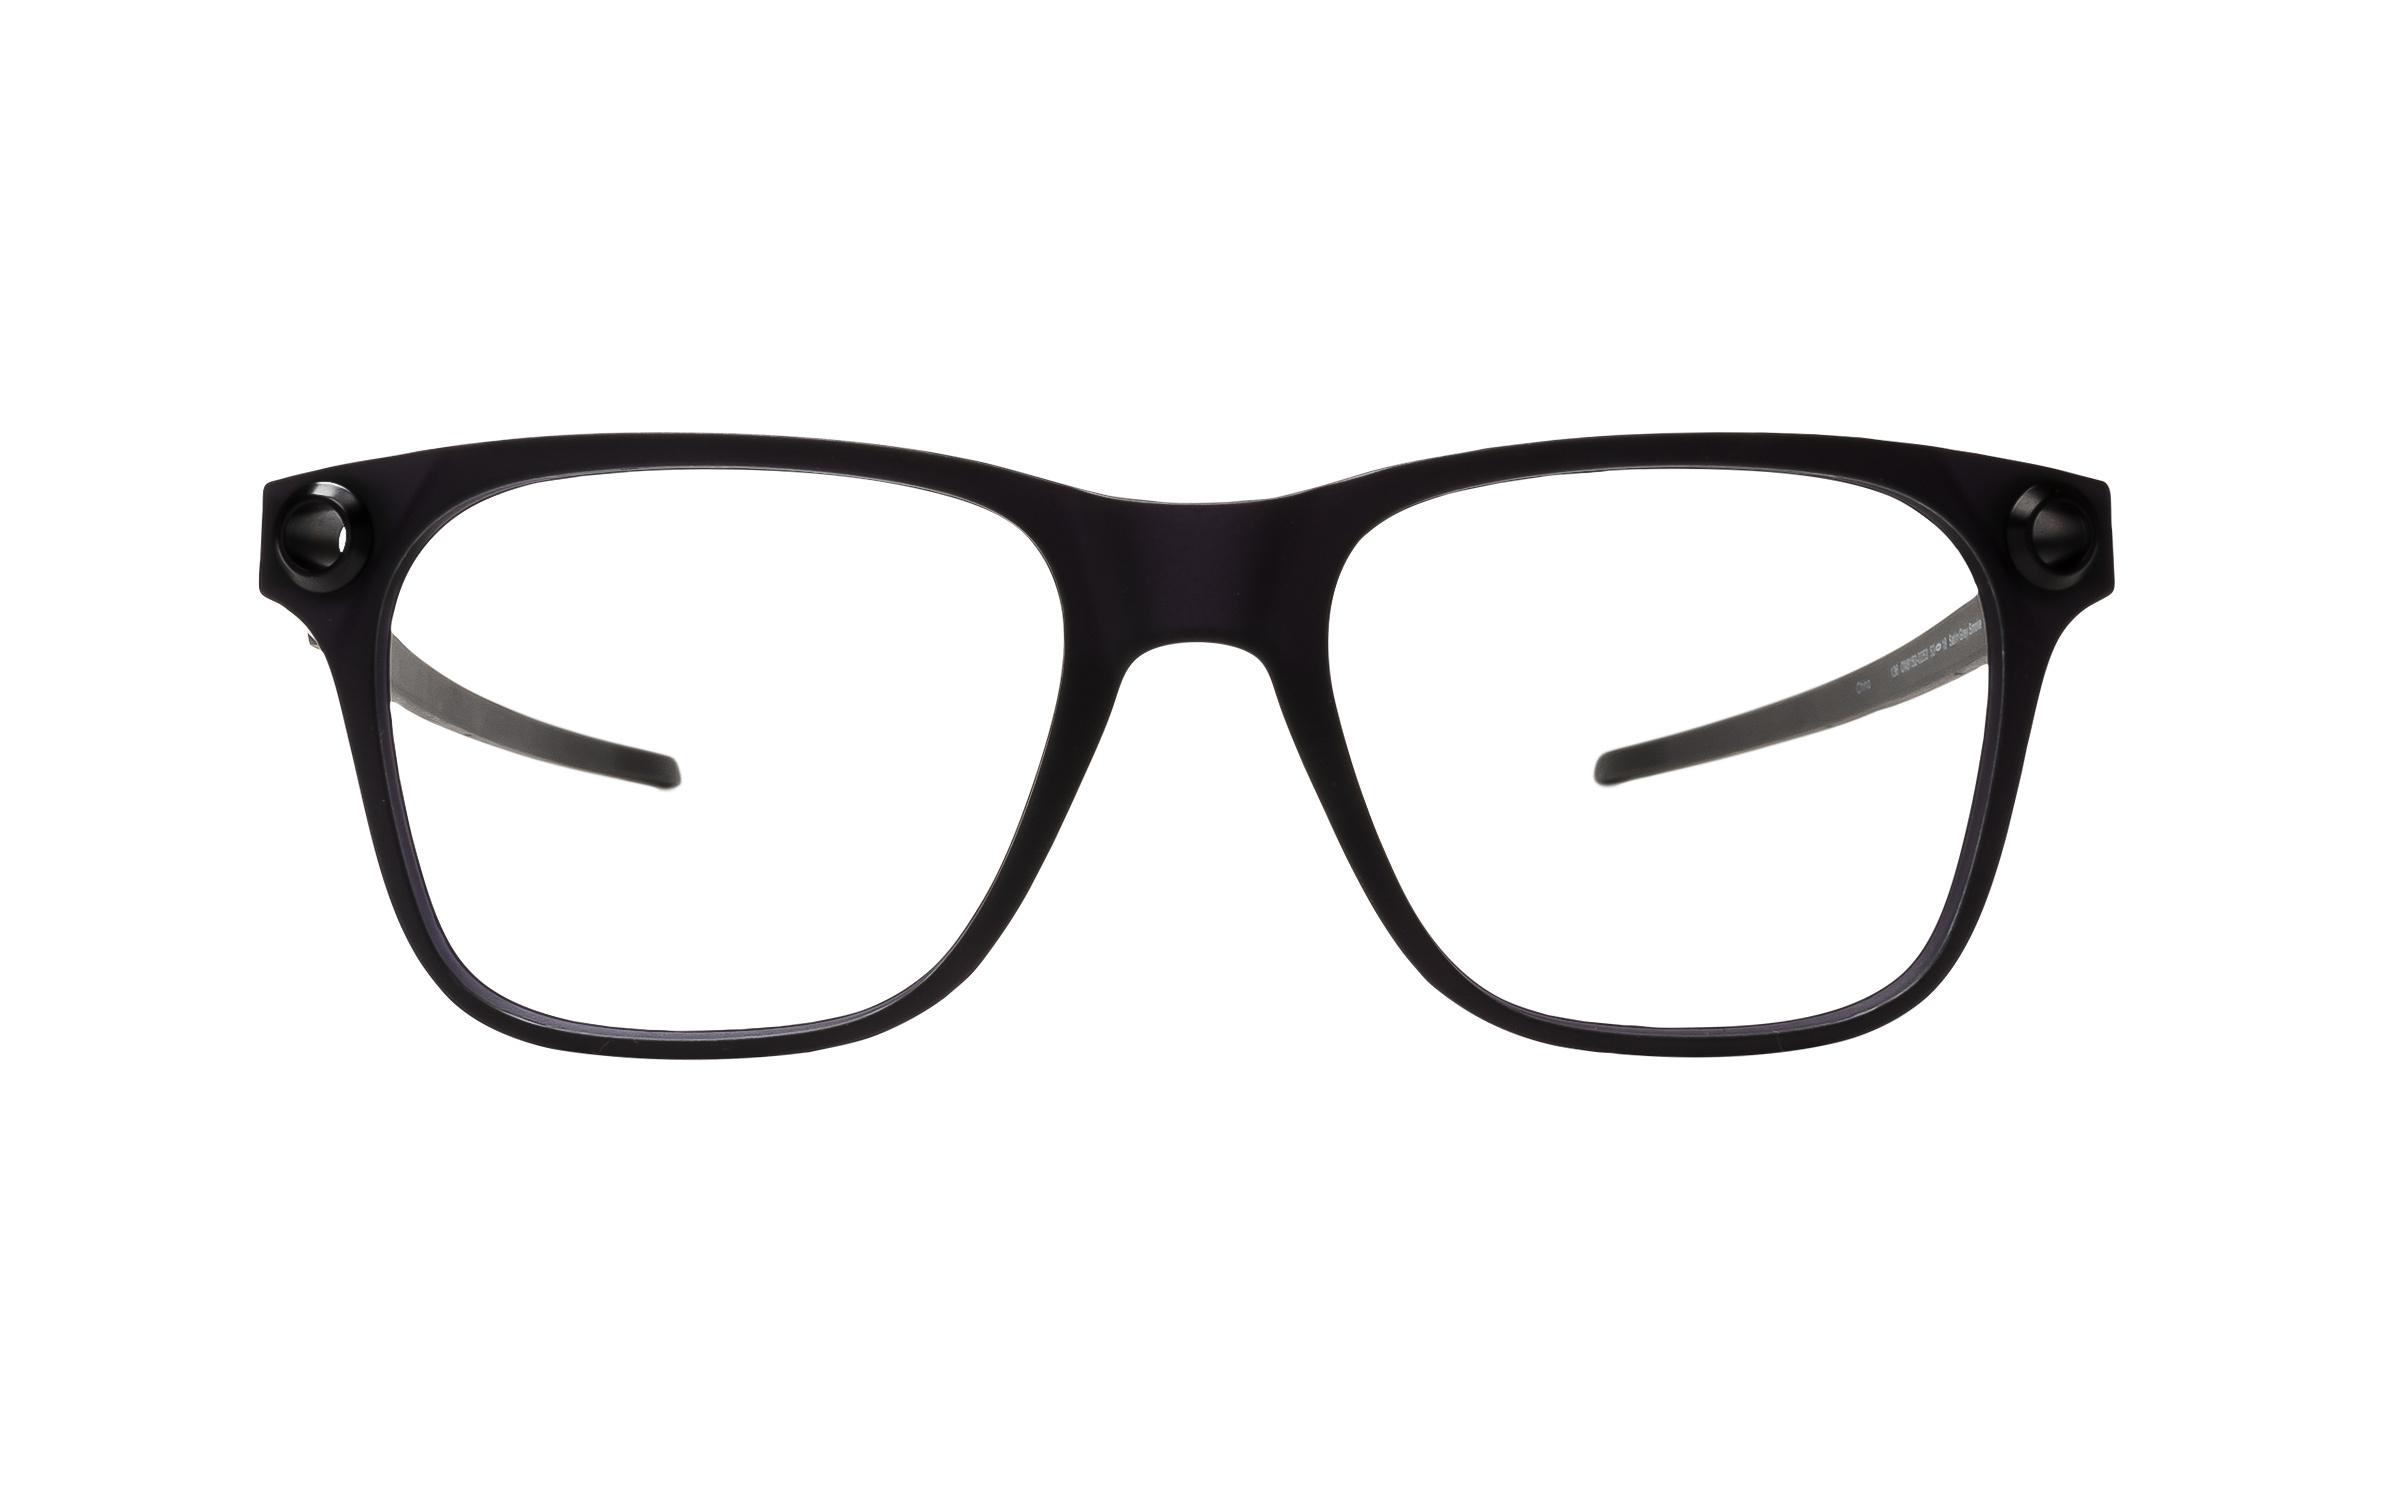 Luxottica Oakley Apparition OX8152 815202 (53) Eyeglasses and Frame in Satin Smoke Black/Grey | Acetate - Online Coastal